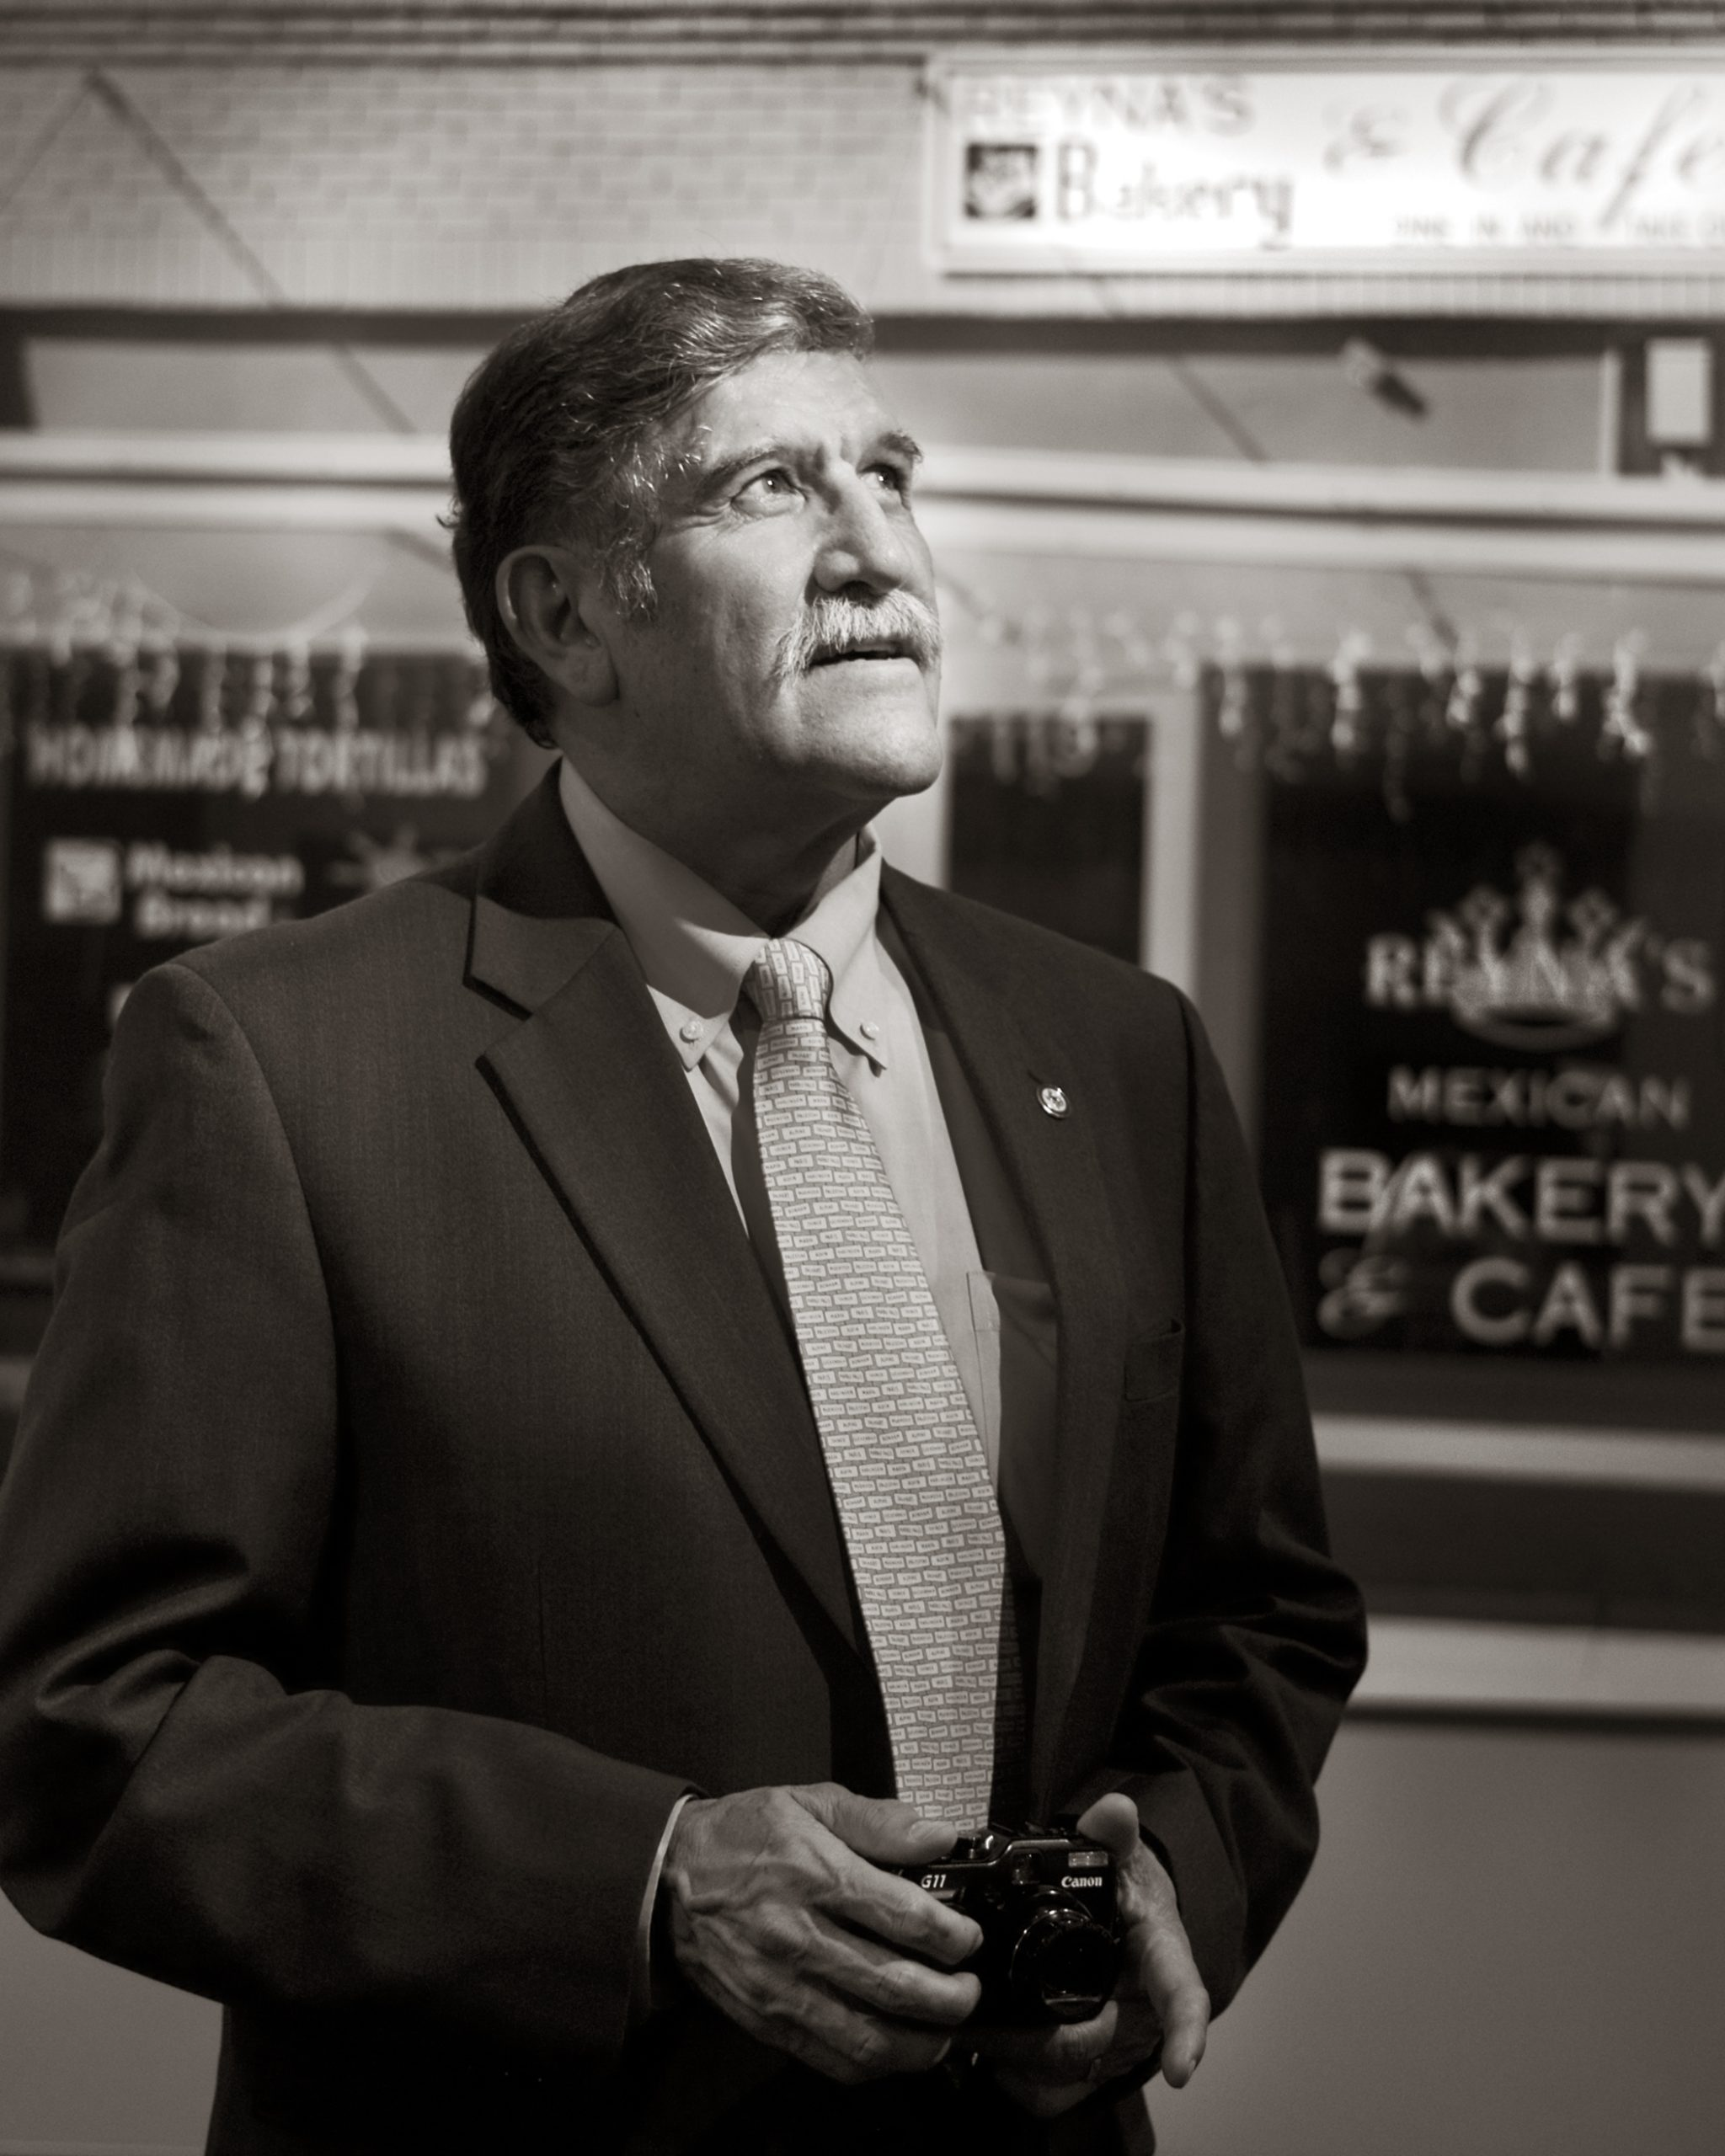 Ricardo Romo, Ph.D., University President and Photographer.